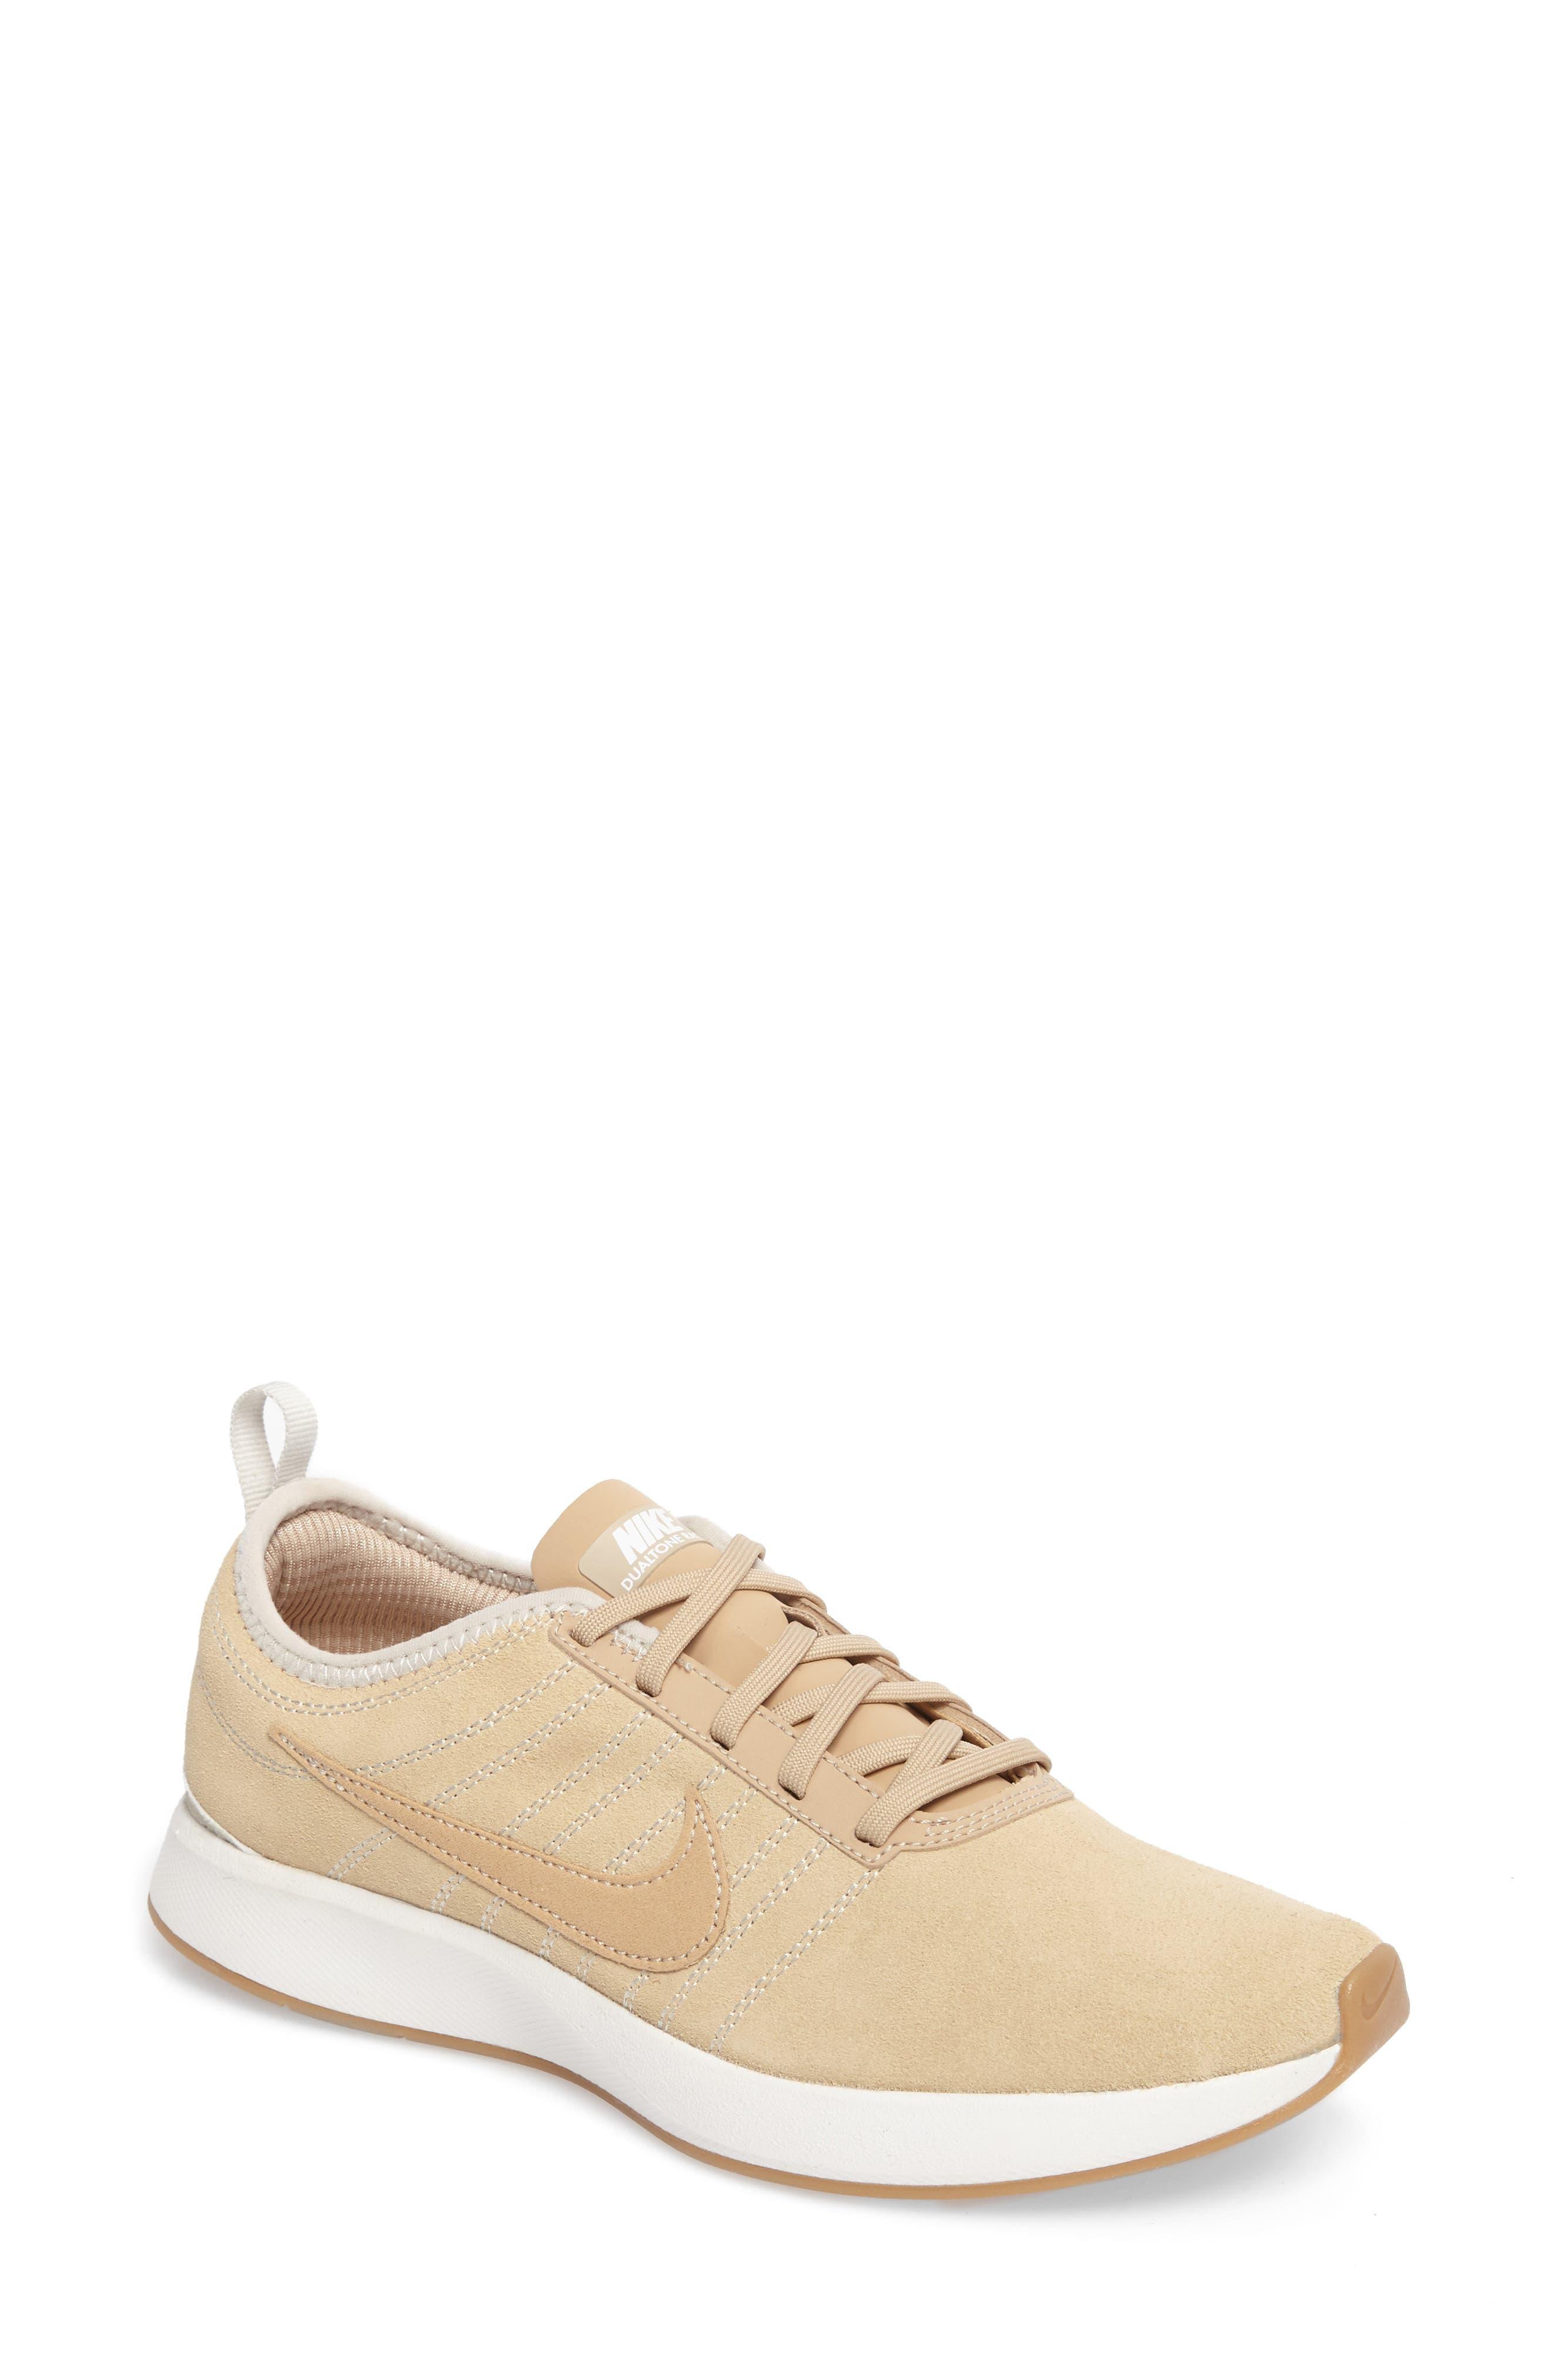 Main Image - Nike Dualtone Racer SE Sneaker (Women)